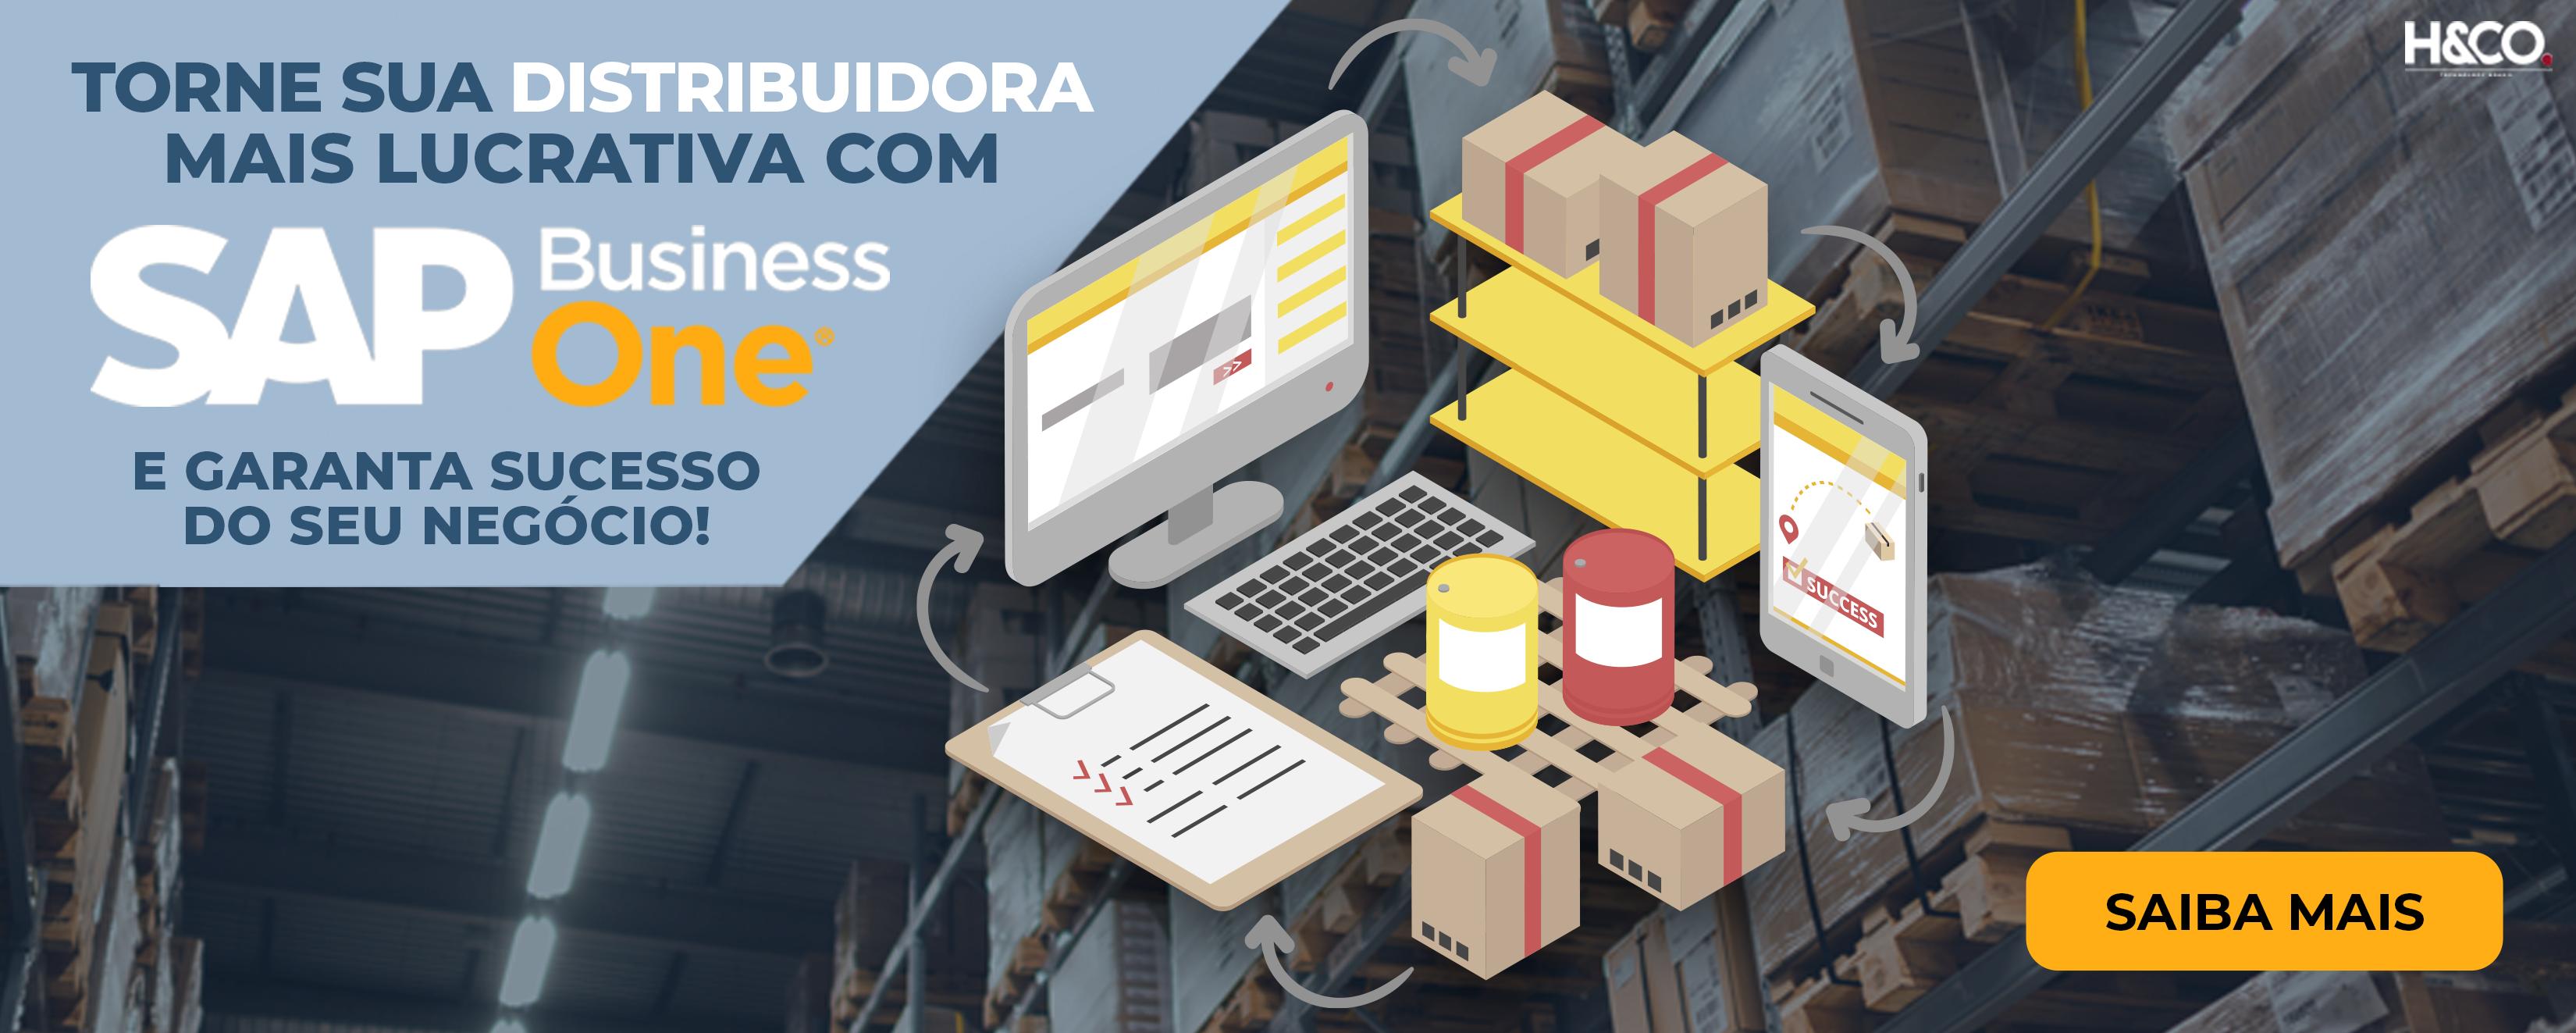 Landing Page - Distribuidoras